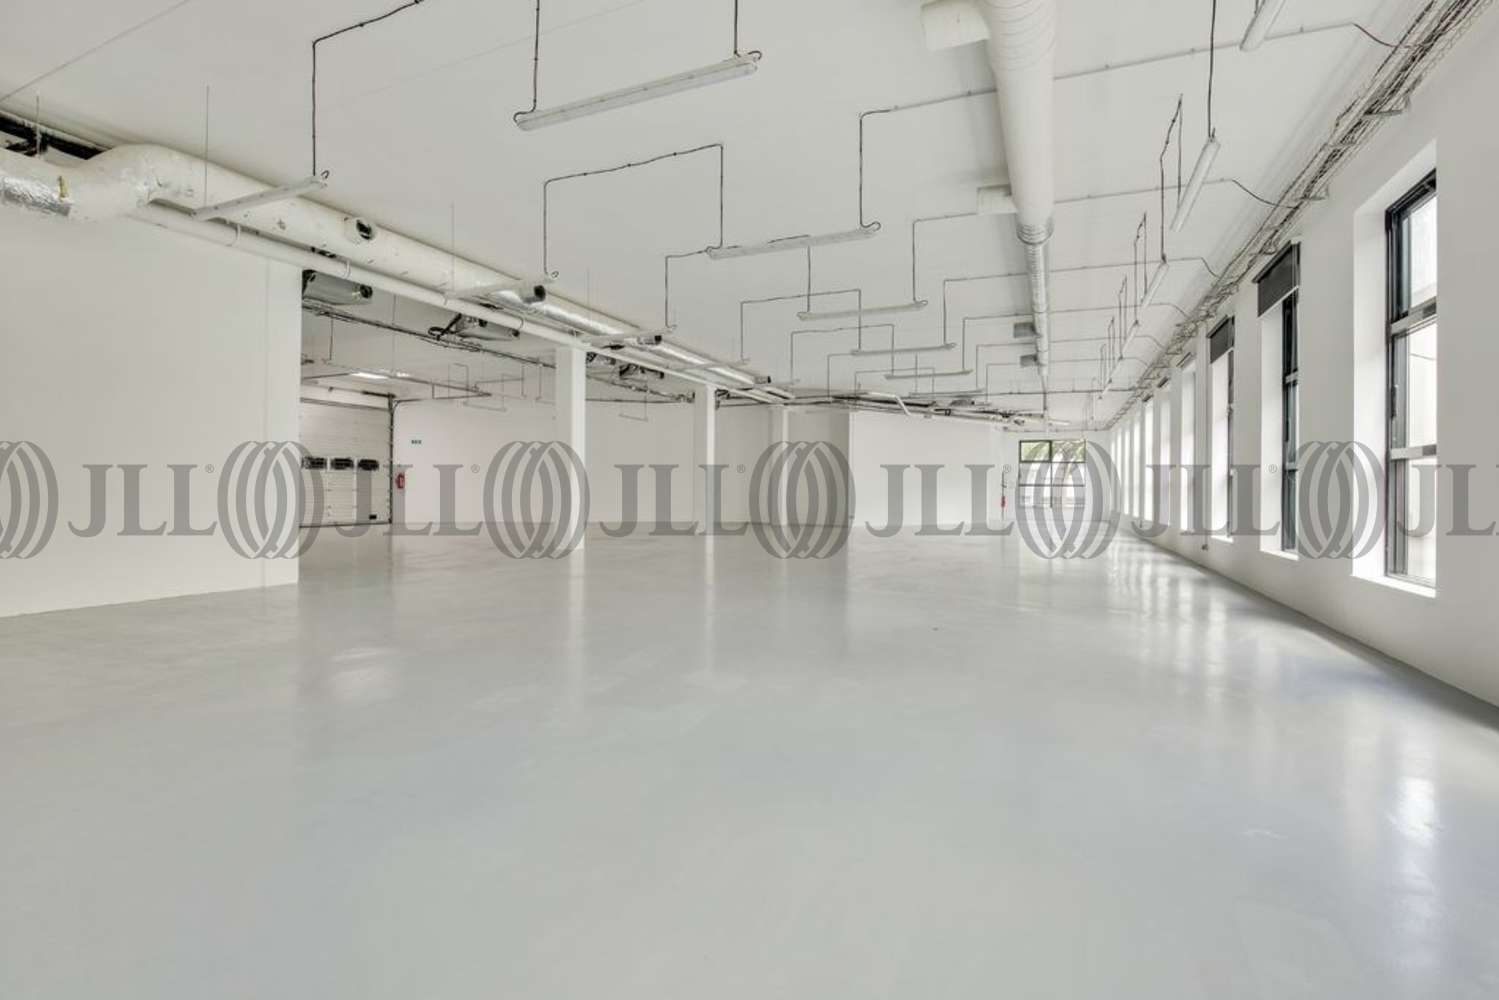 Activités/entrepôt Clichy, 92110 - LE CAPELLA - 10476246